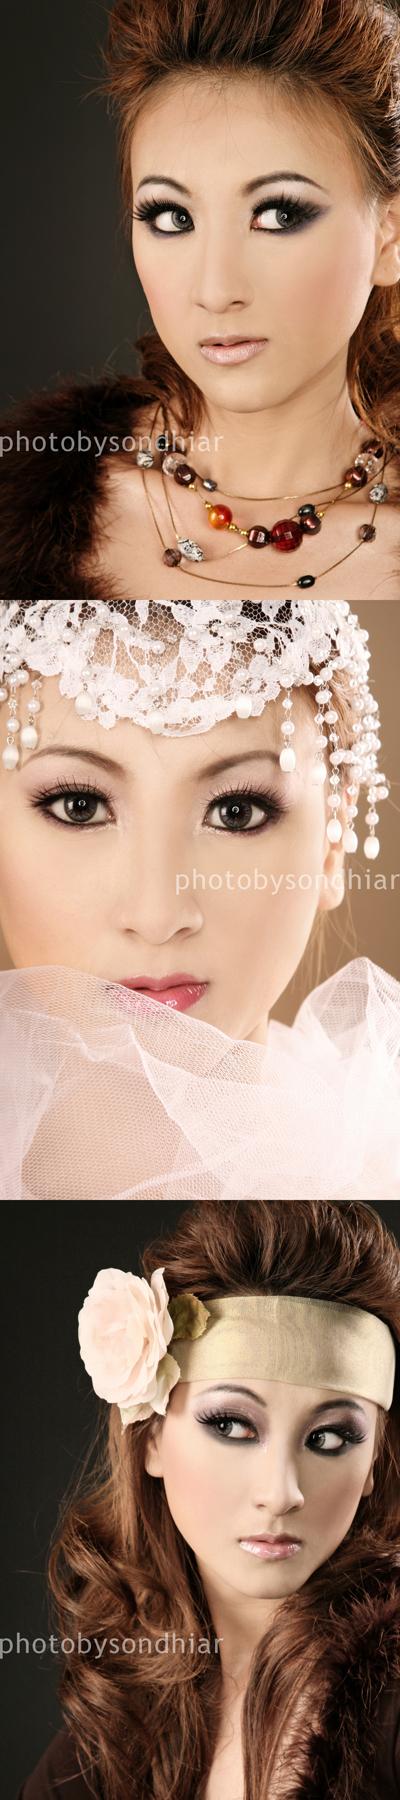 jonas pro studio - bandung Aug 09, 2008 photobysondhiar  grace for mayke, the professional makeup artist